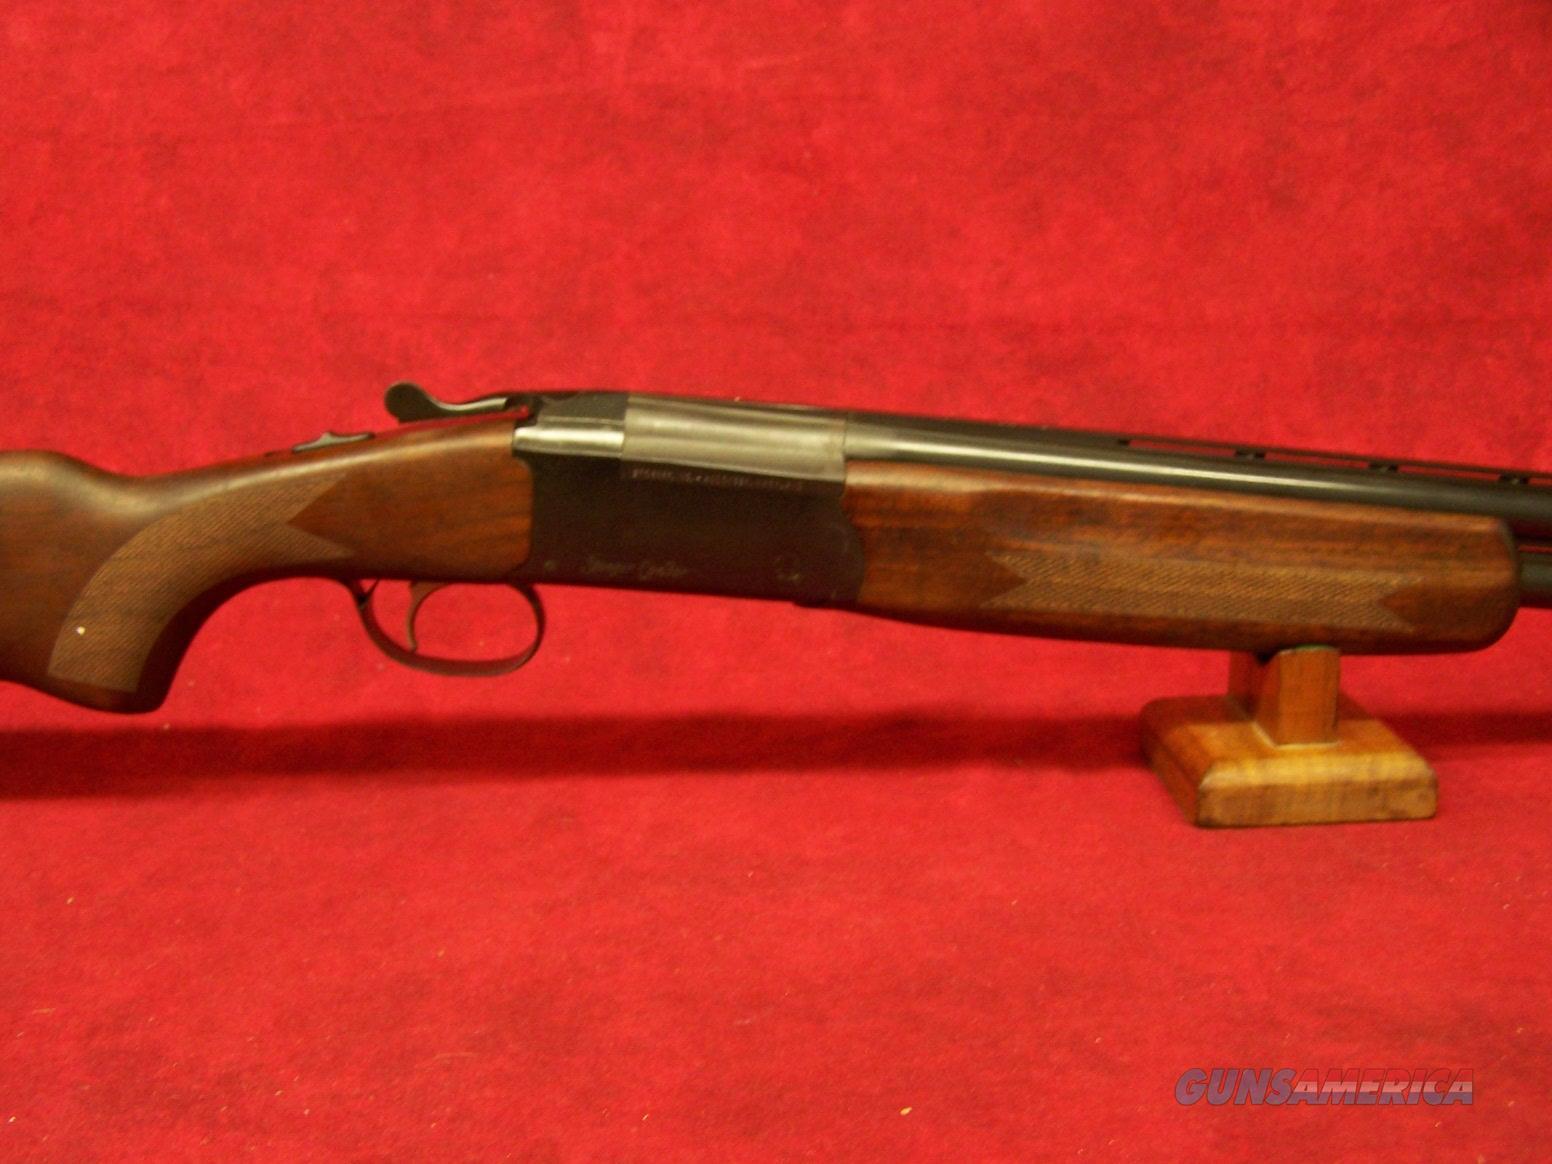 "Stoeger Condor 20Ga 3"" O/U A-Grade Satin Walnut 26"" (31035)  Guns > Shotguns > Stoeger Shotguns"